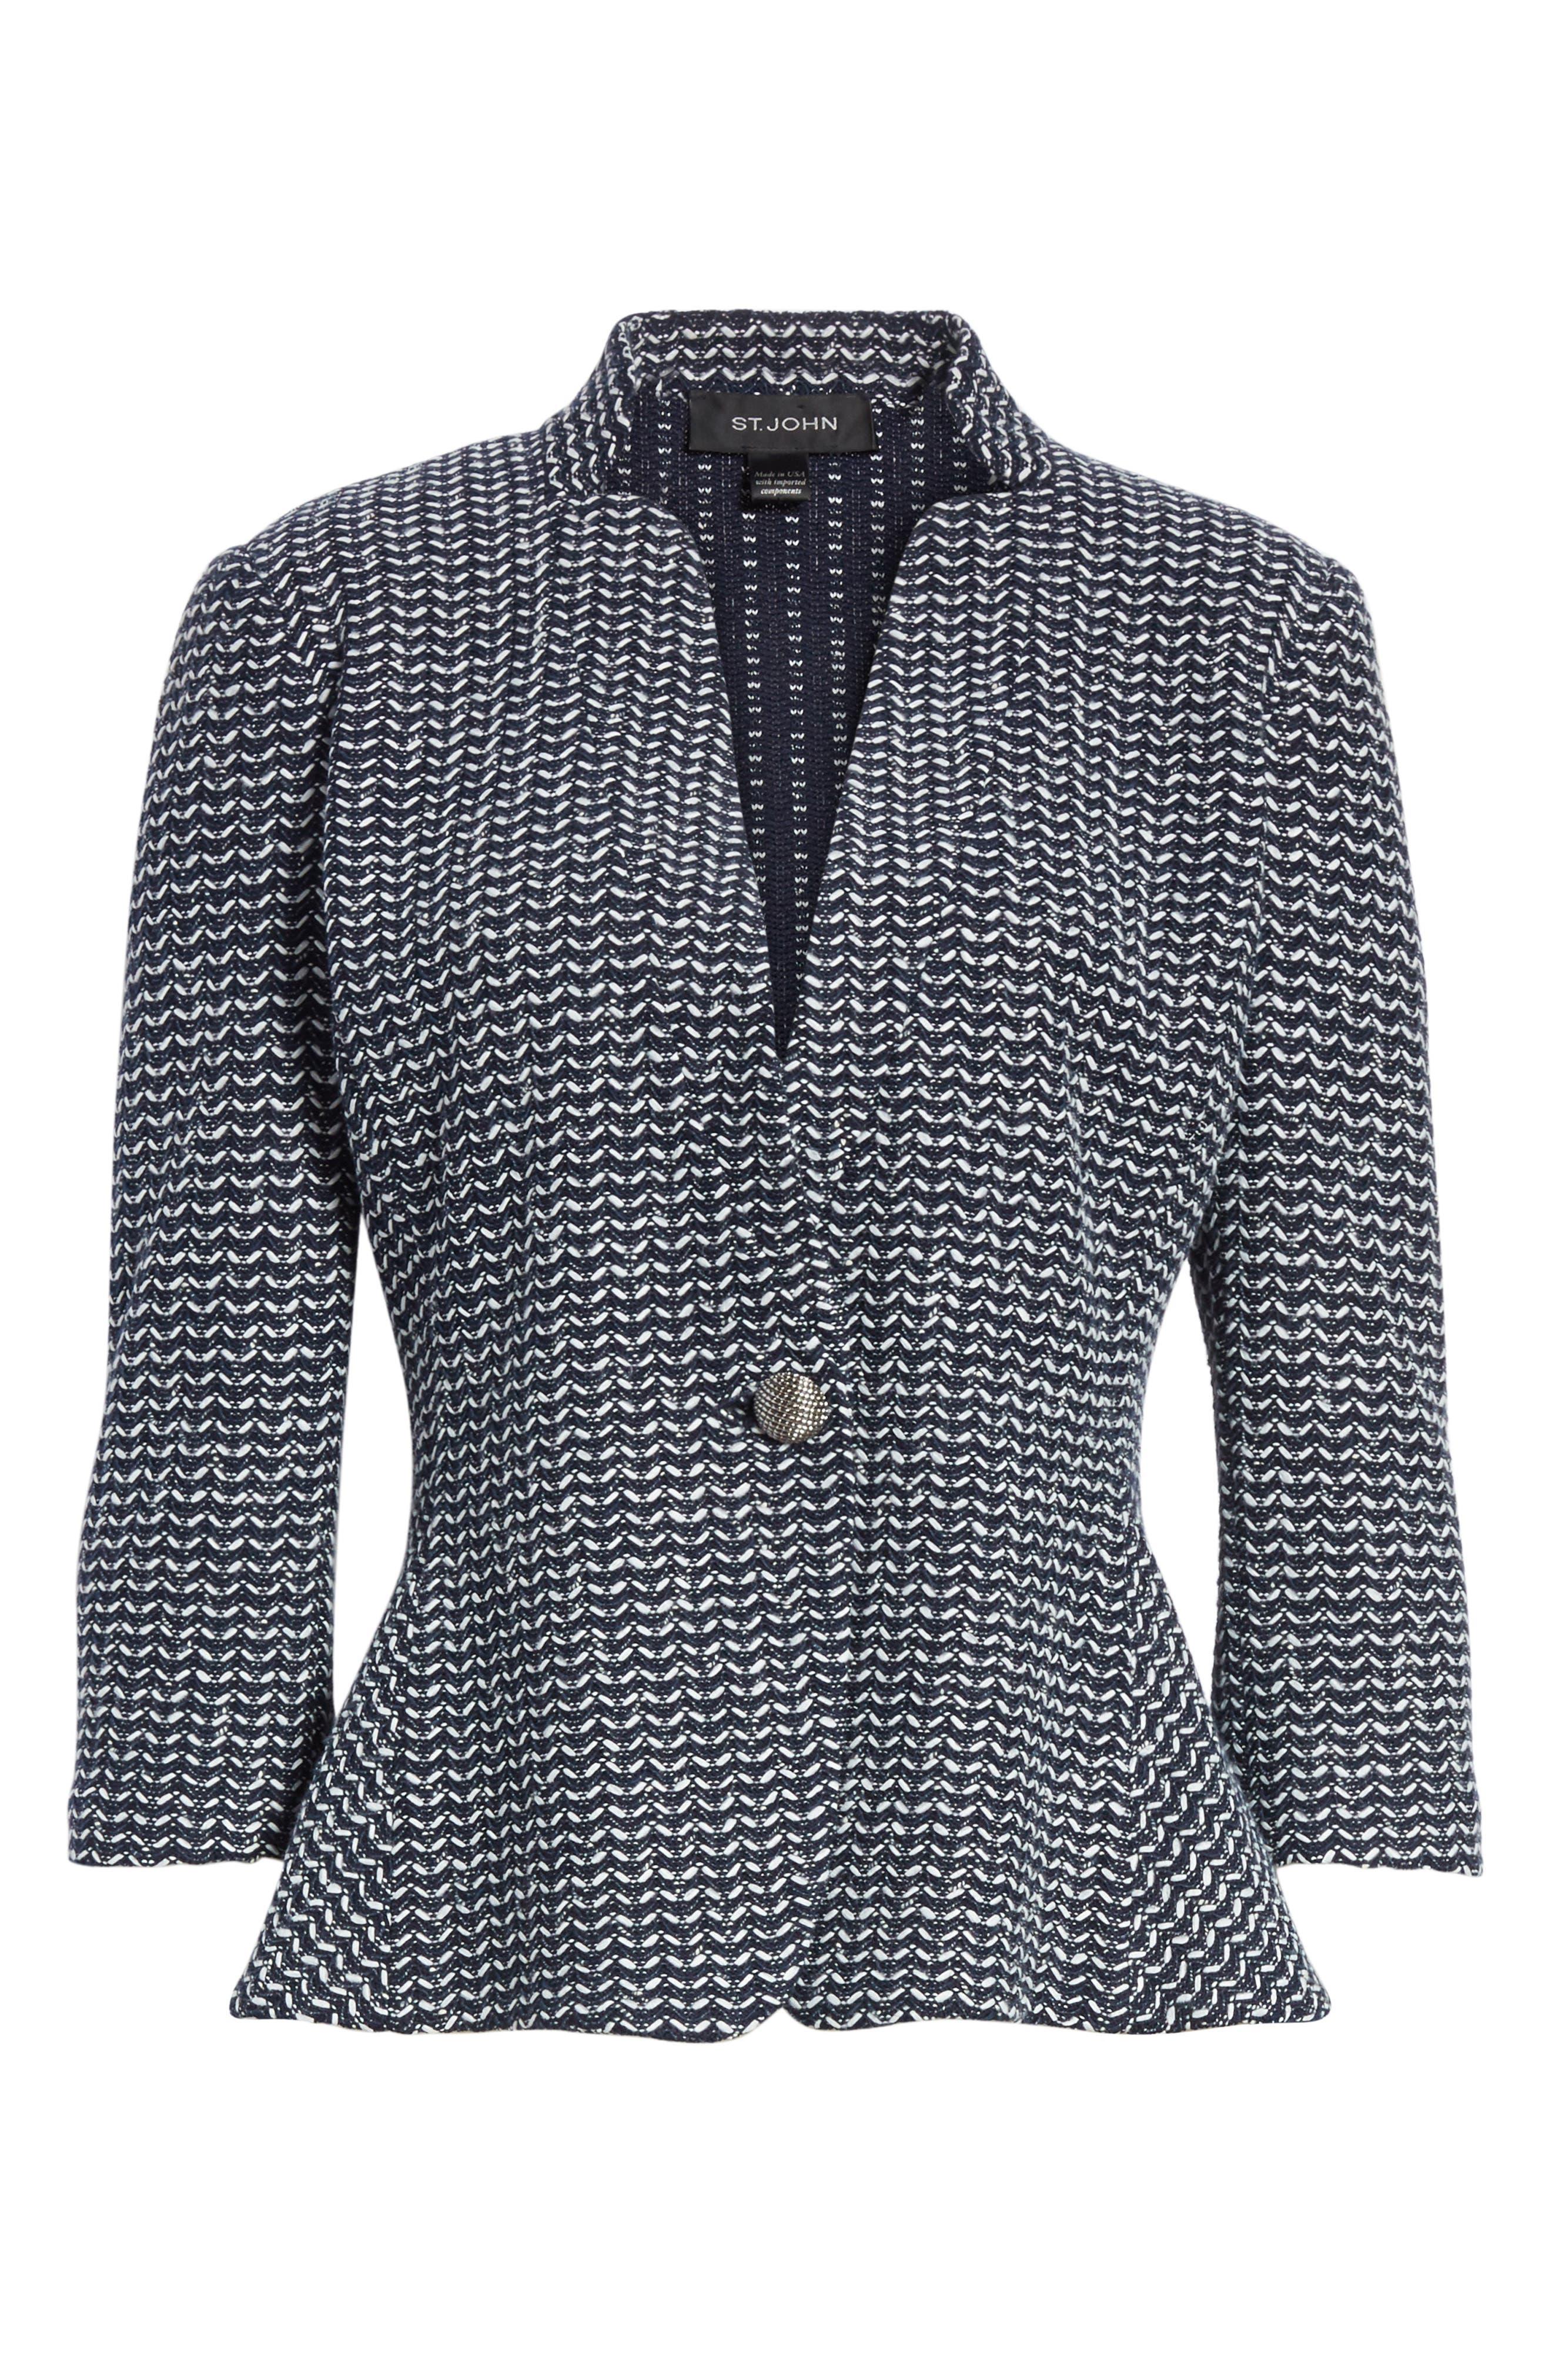 Chevron Knit Jacket,                             Alternate thumbnail 6, color,                             Navy Multi